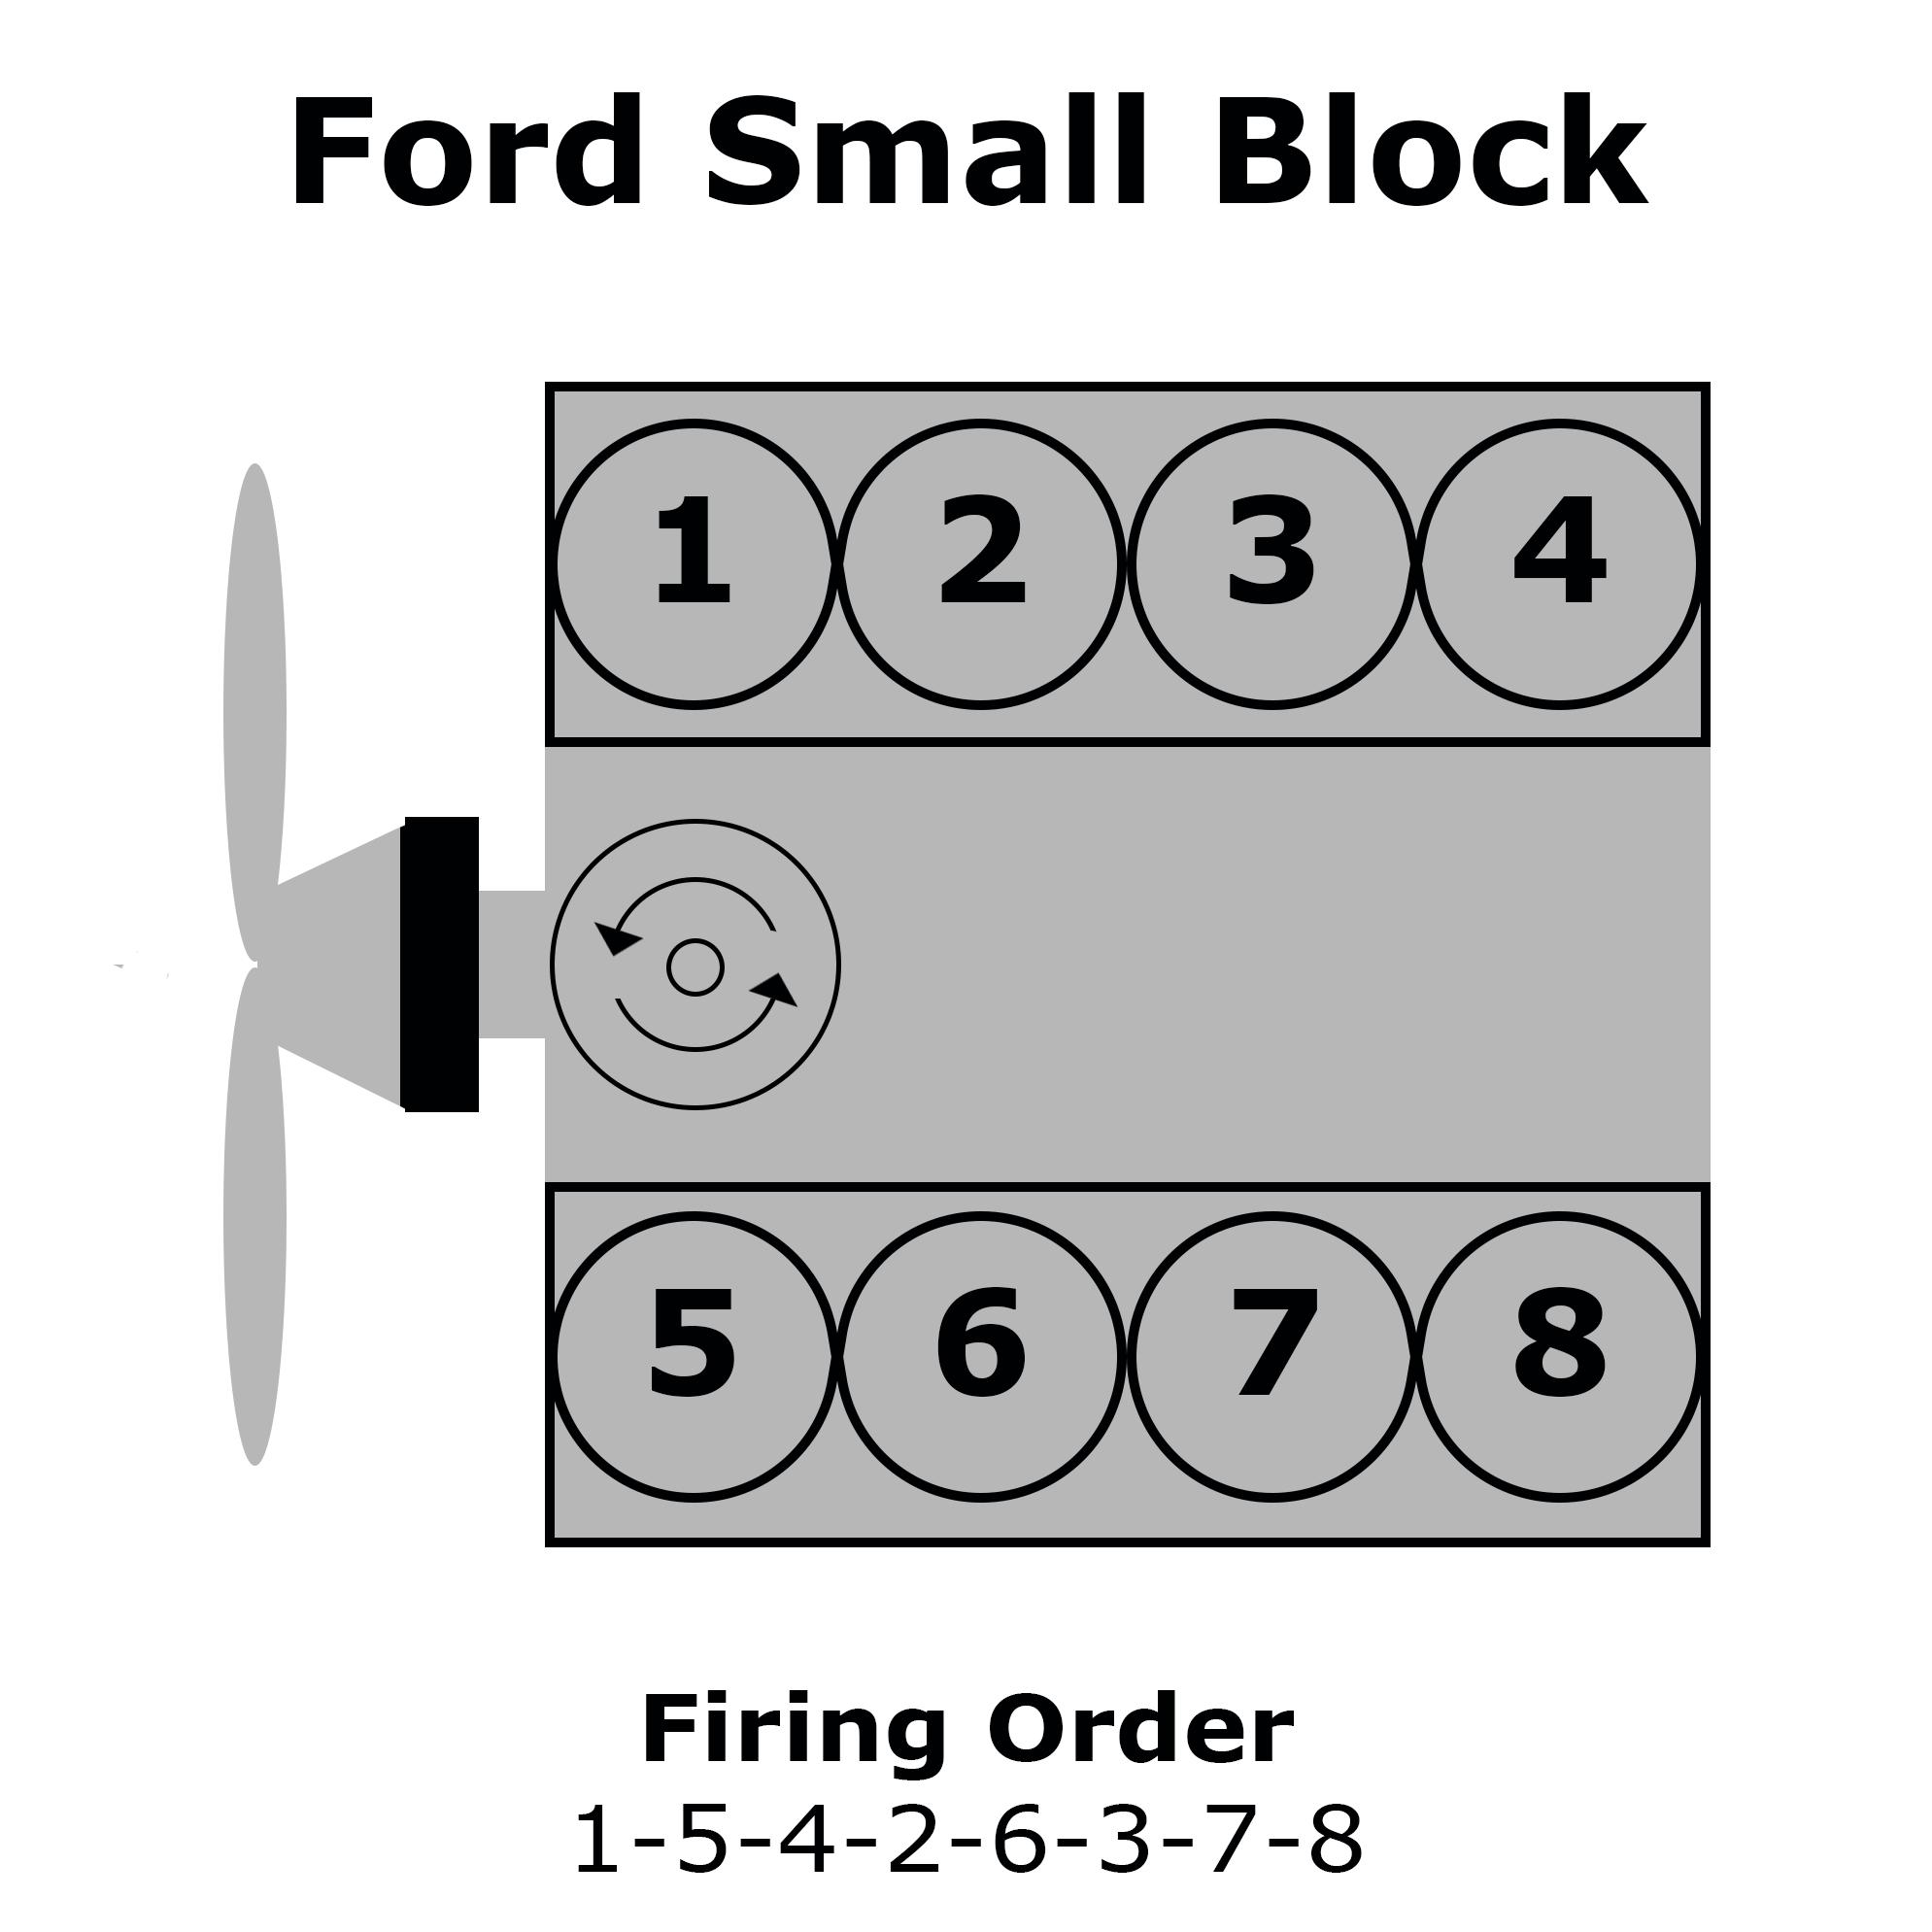 Ford Small Block Firing Order